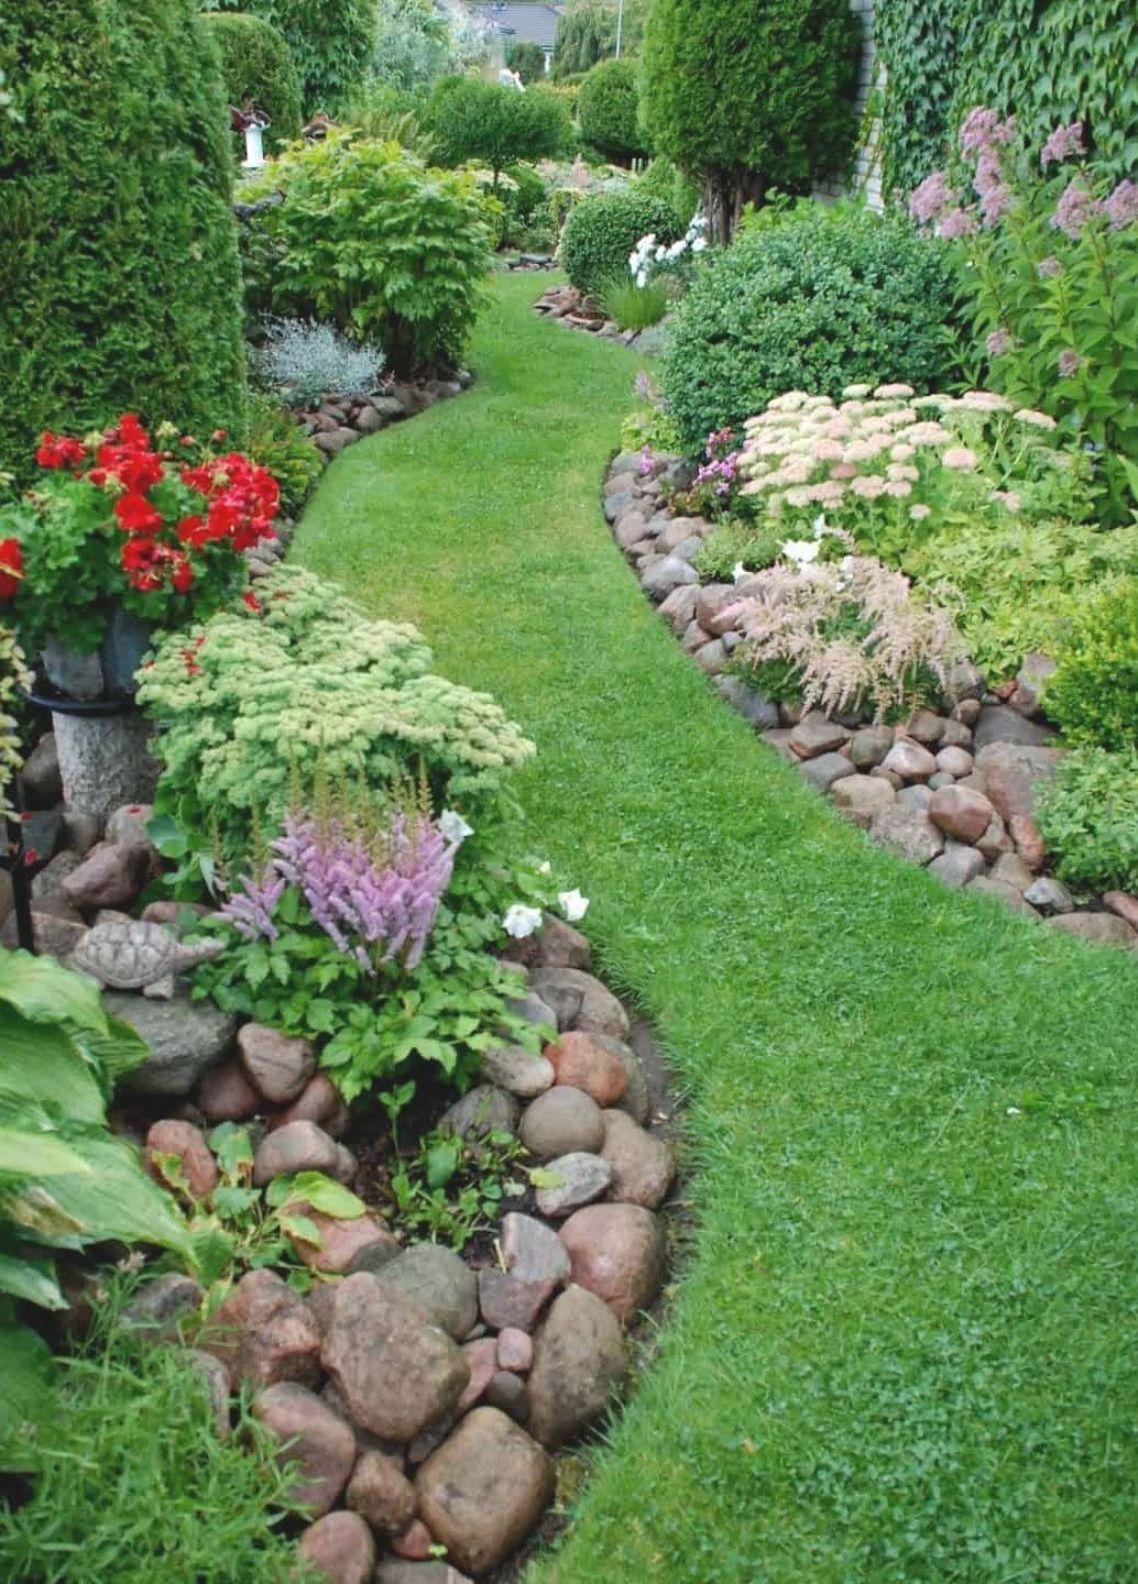 An easy curb appeal tip: Build berms #curbAppeal #landscaping #backyard #backyarddesign  #backyard #garden